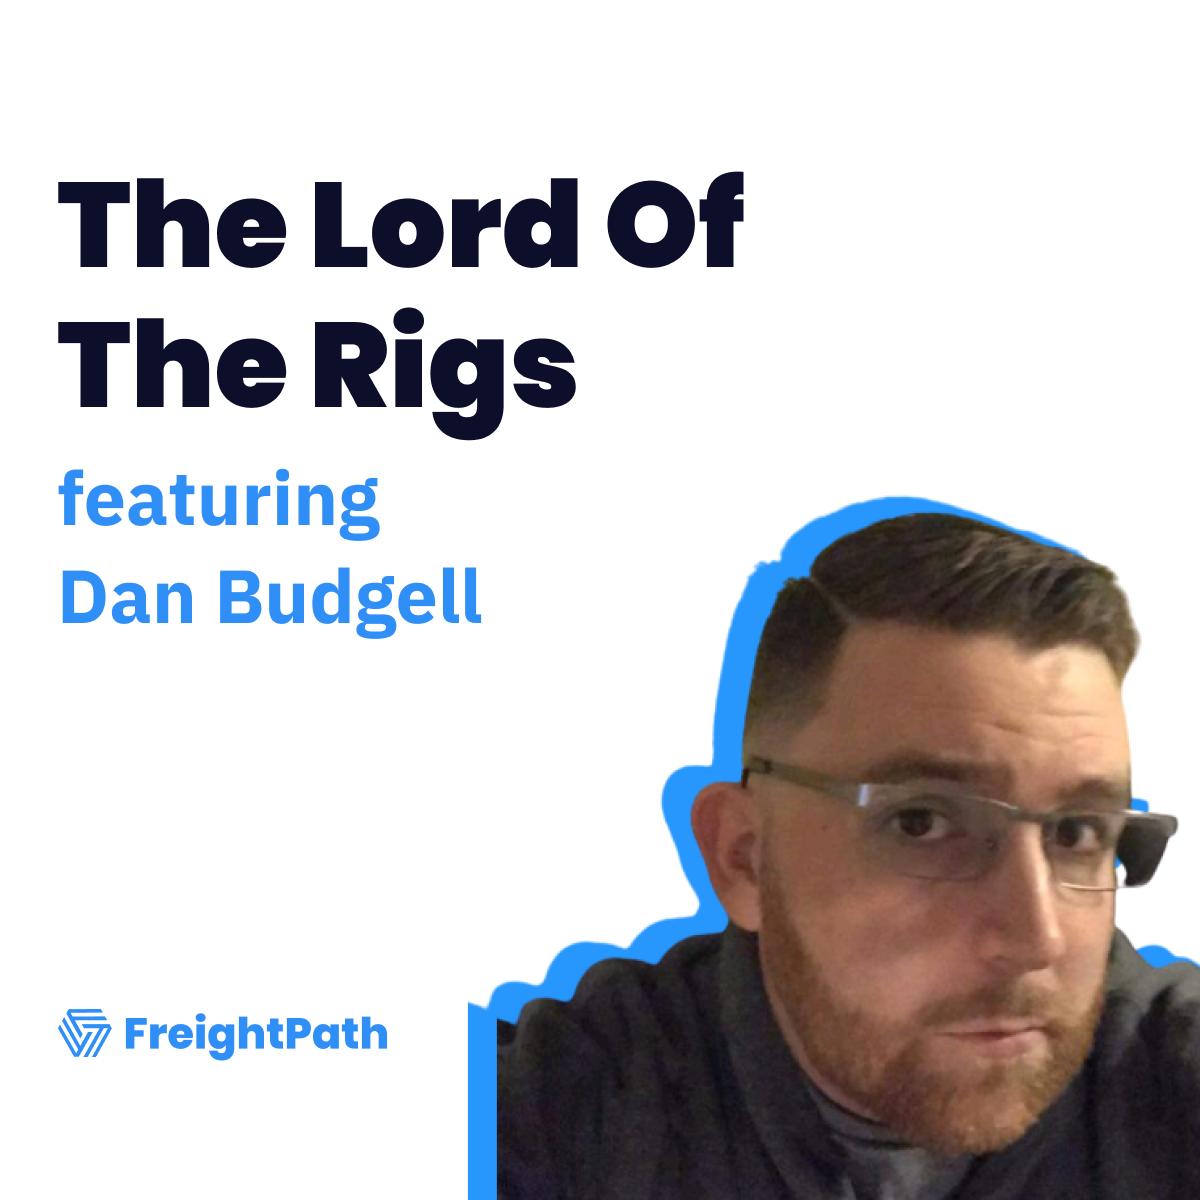 How Dan Budgell Bridges The Gap Between Technology And Trucking